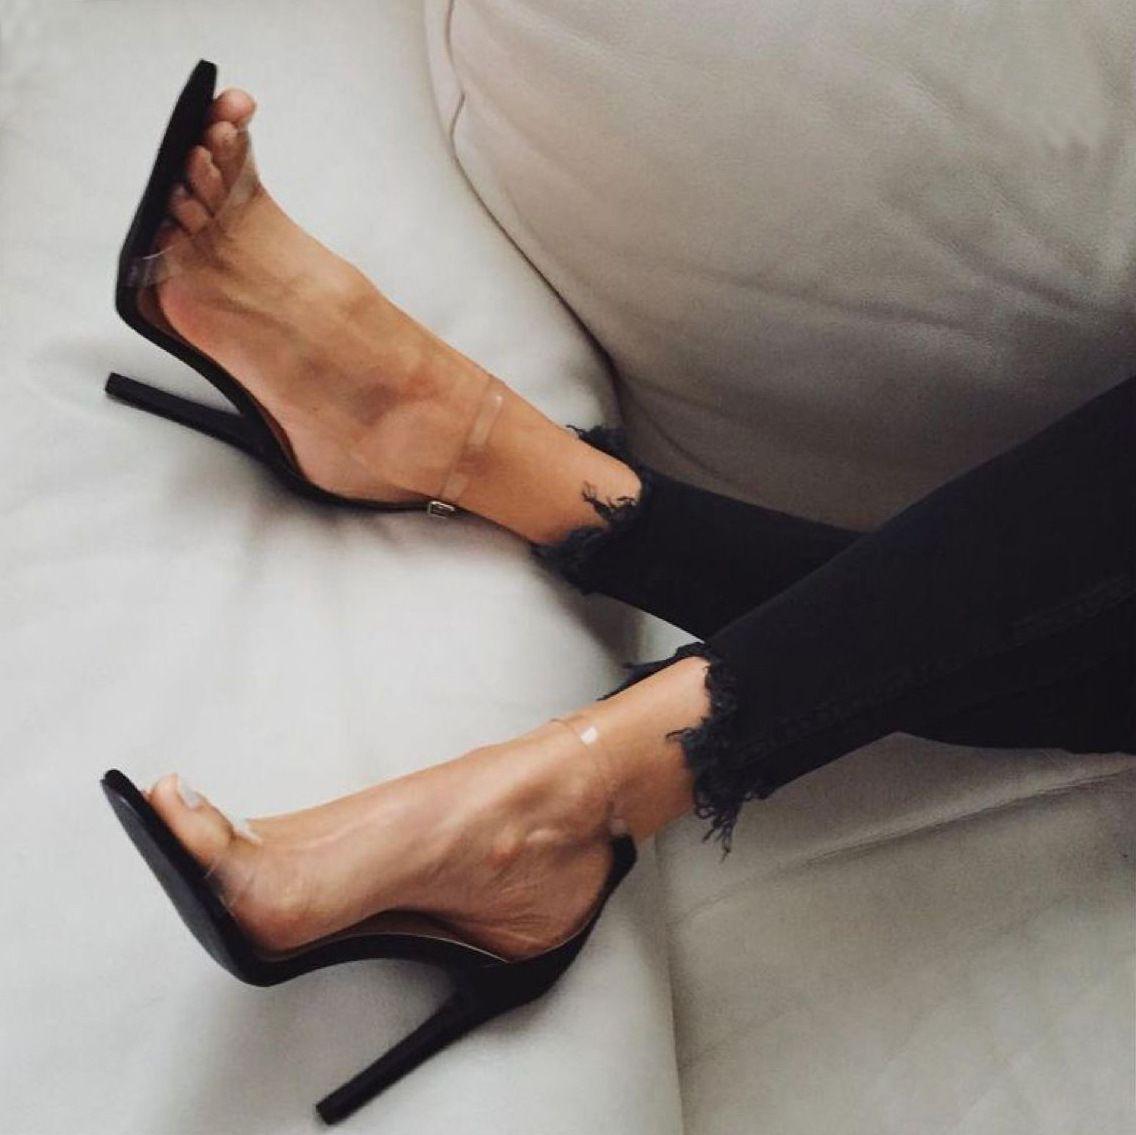 Ankle strap high heels, Sandals heels